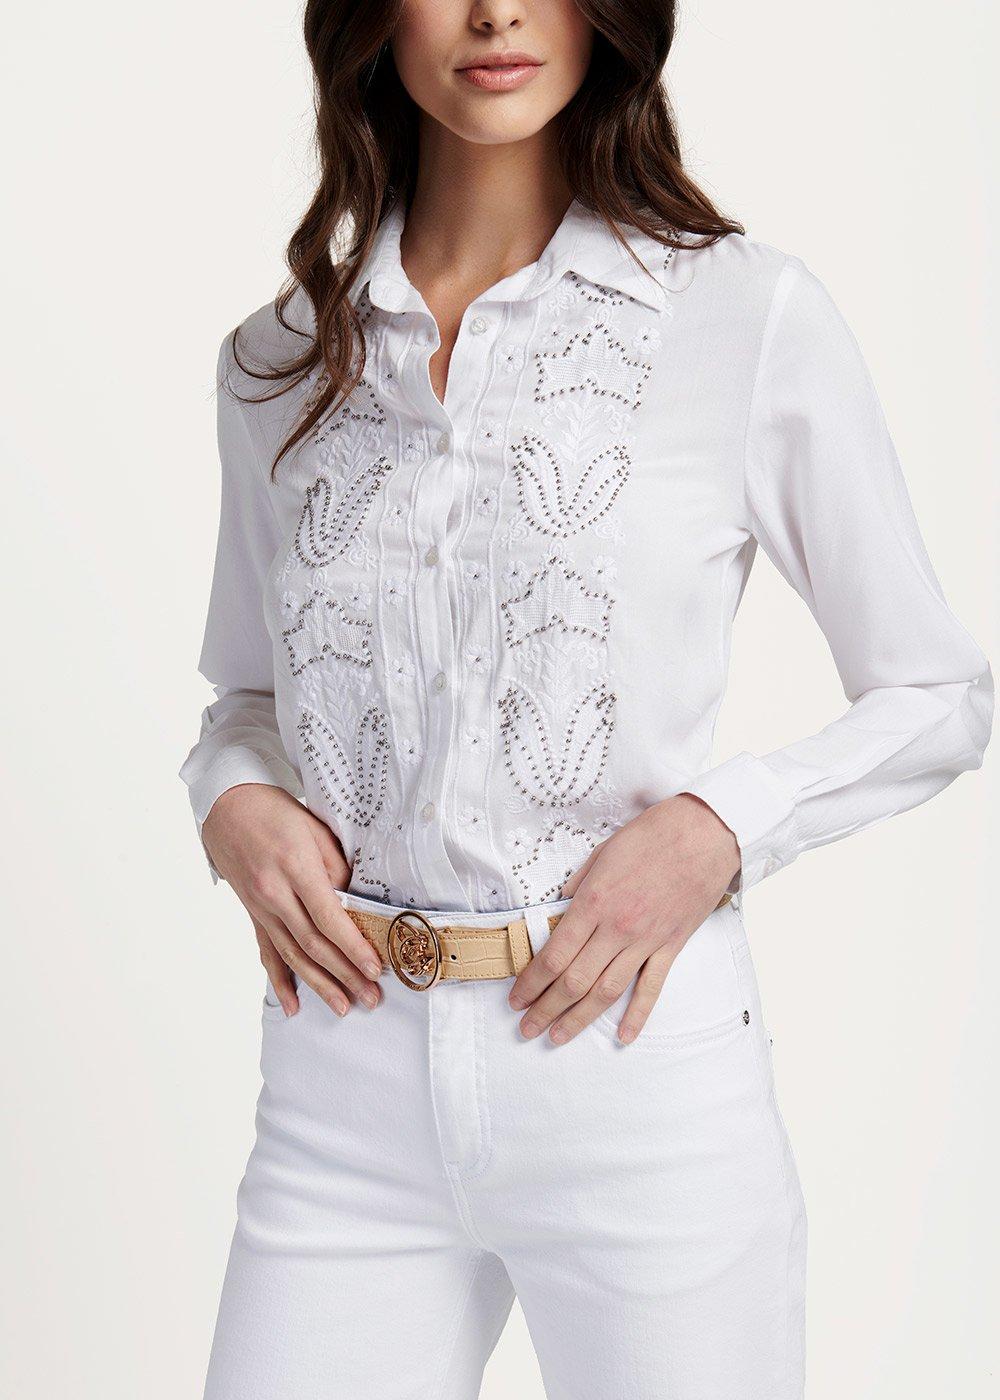 Corinne shirt with gun metal details - White - Woman